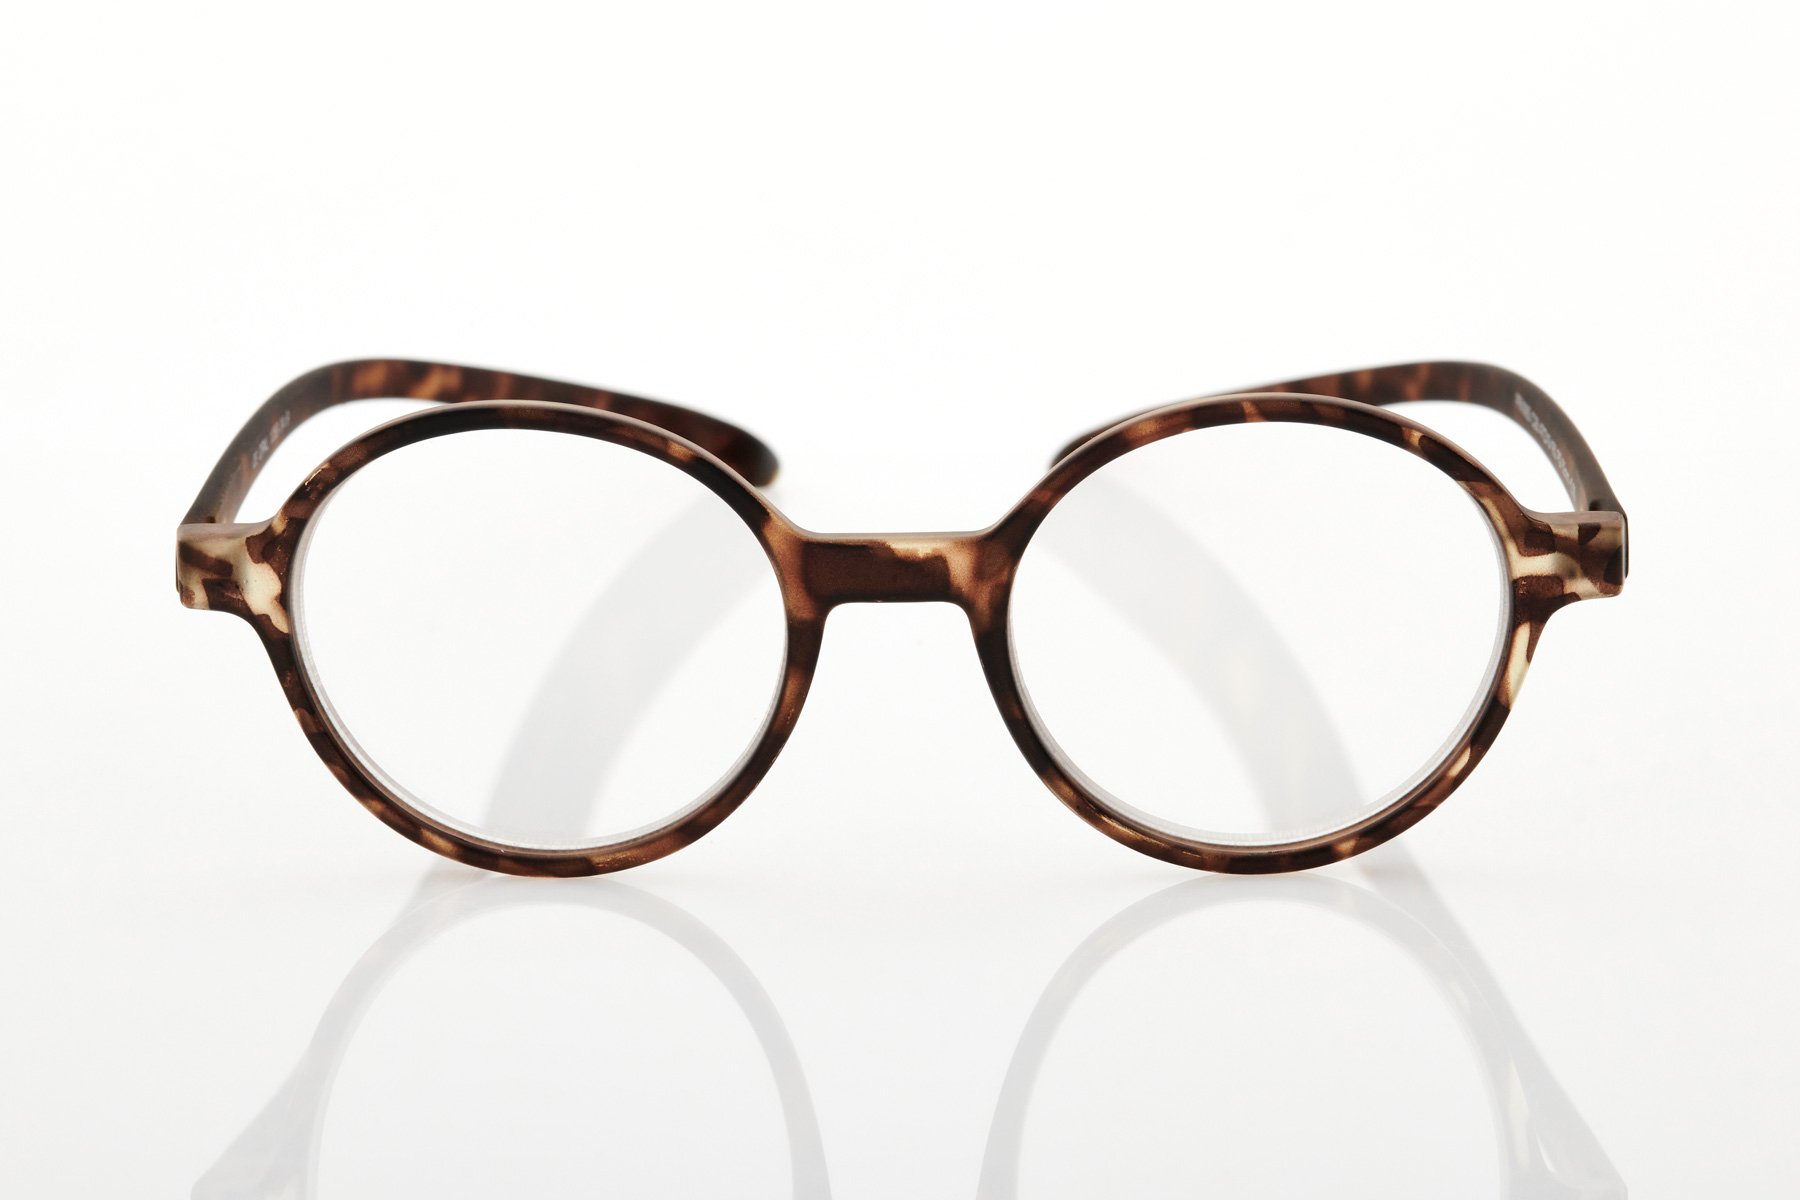 Proximo tortoise reading glasses